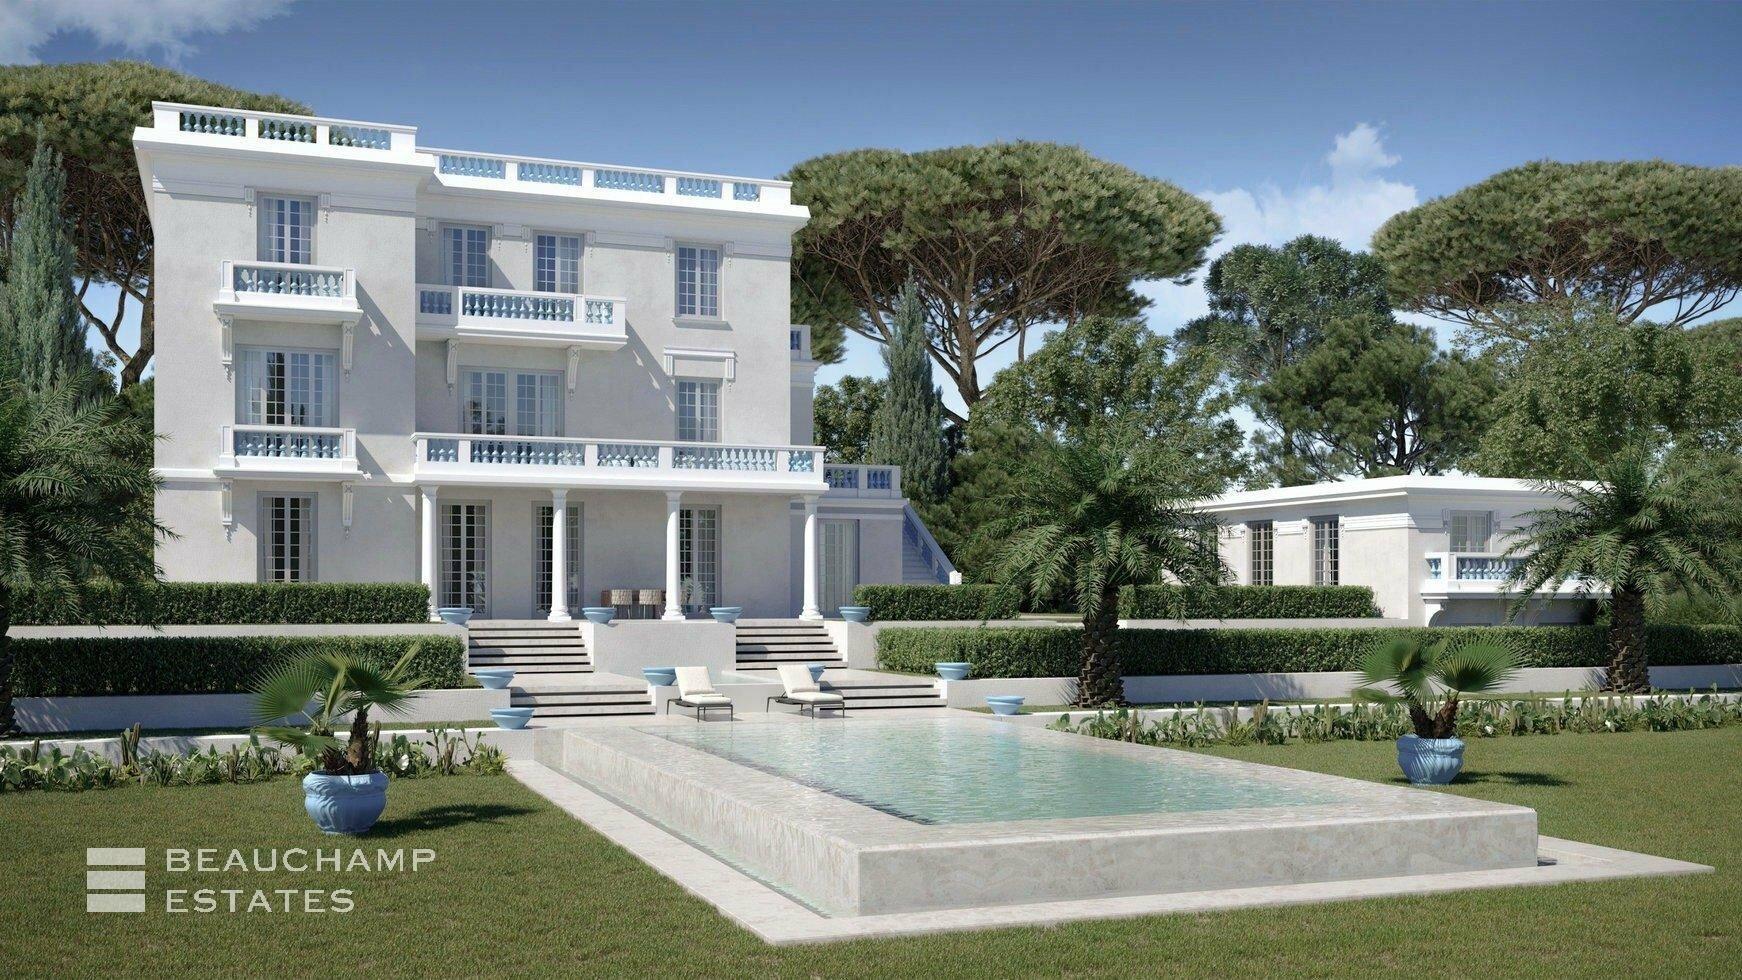 Villa in Antibes, Provence-Alpes-Côte d'Azur, France 1 - 11202116